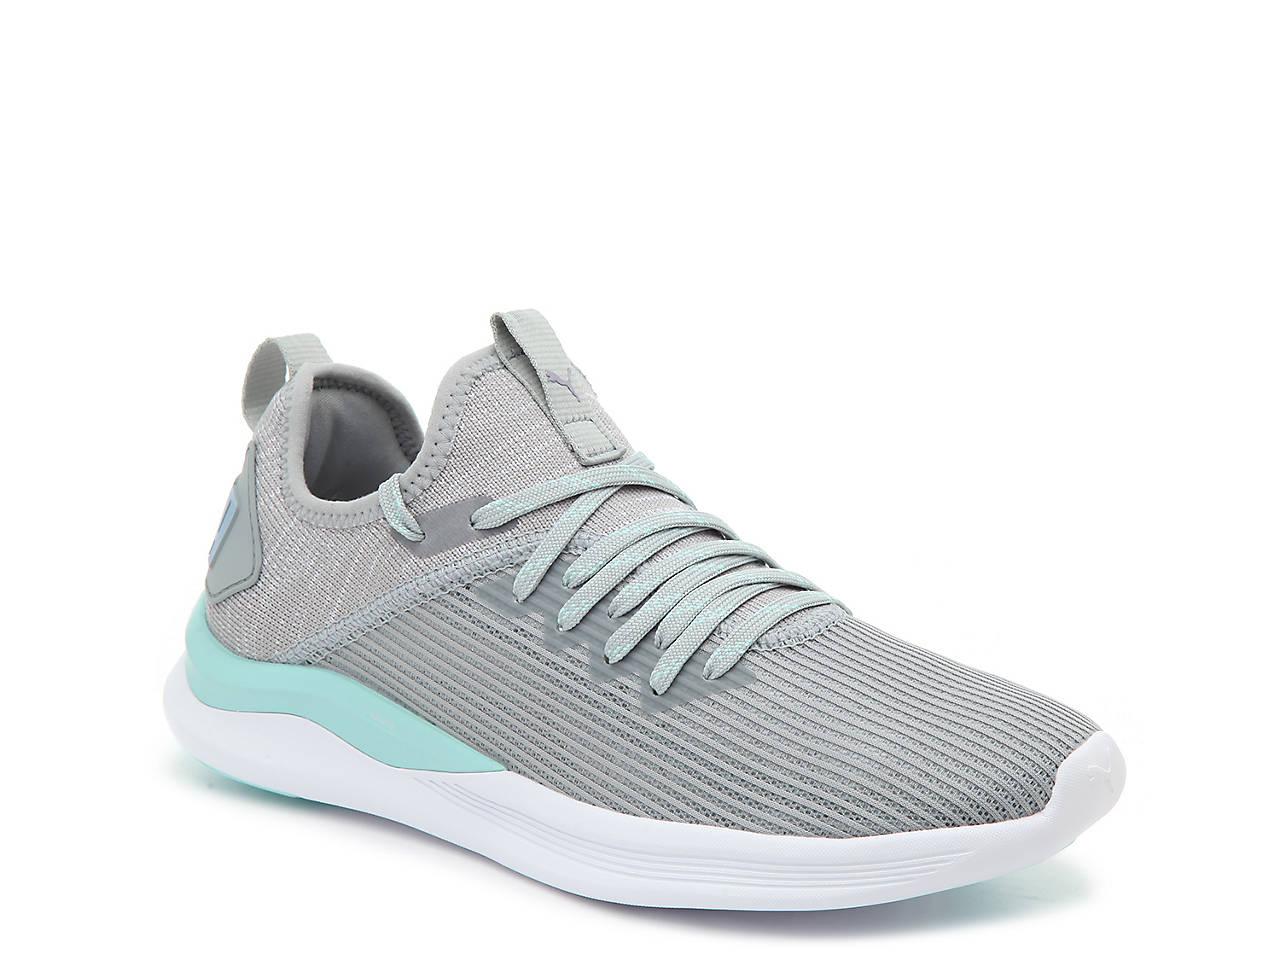 1c90ef01ed646c Puma Ignite Flash Lightweight Training Shoe - Women s Women s Shoes ...